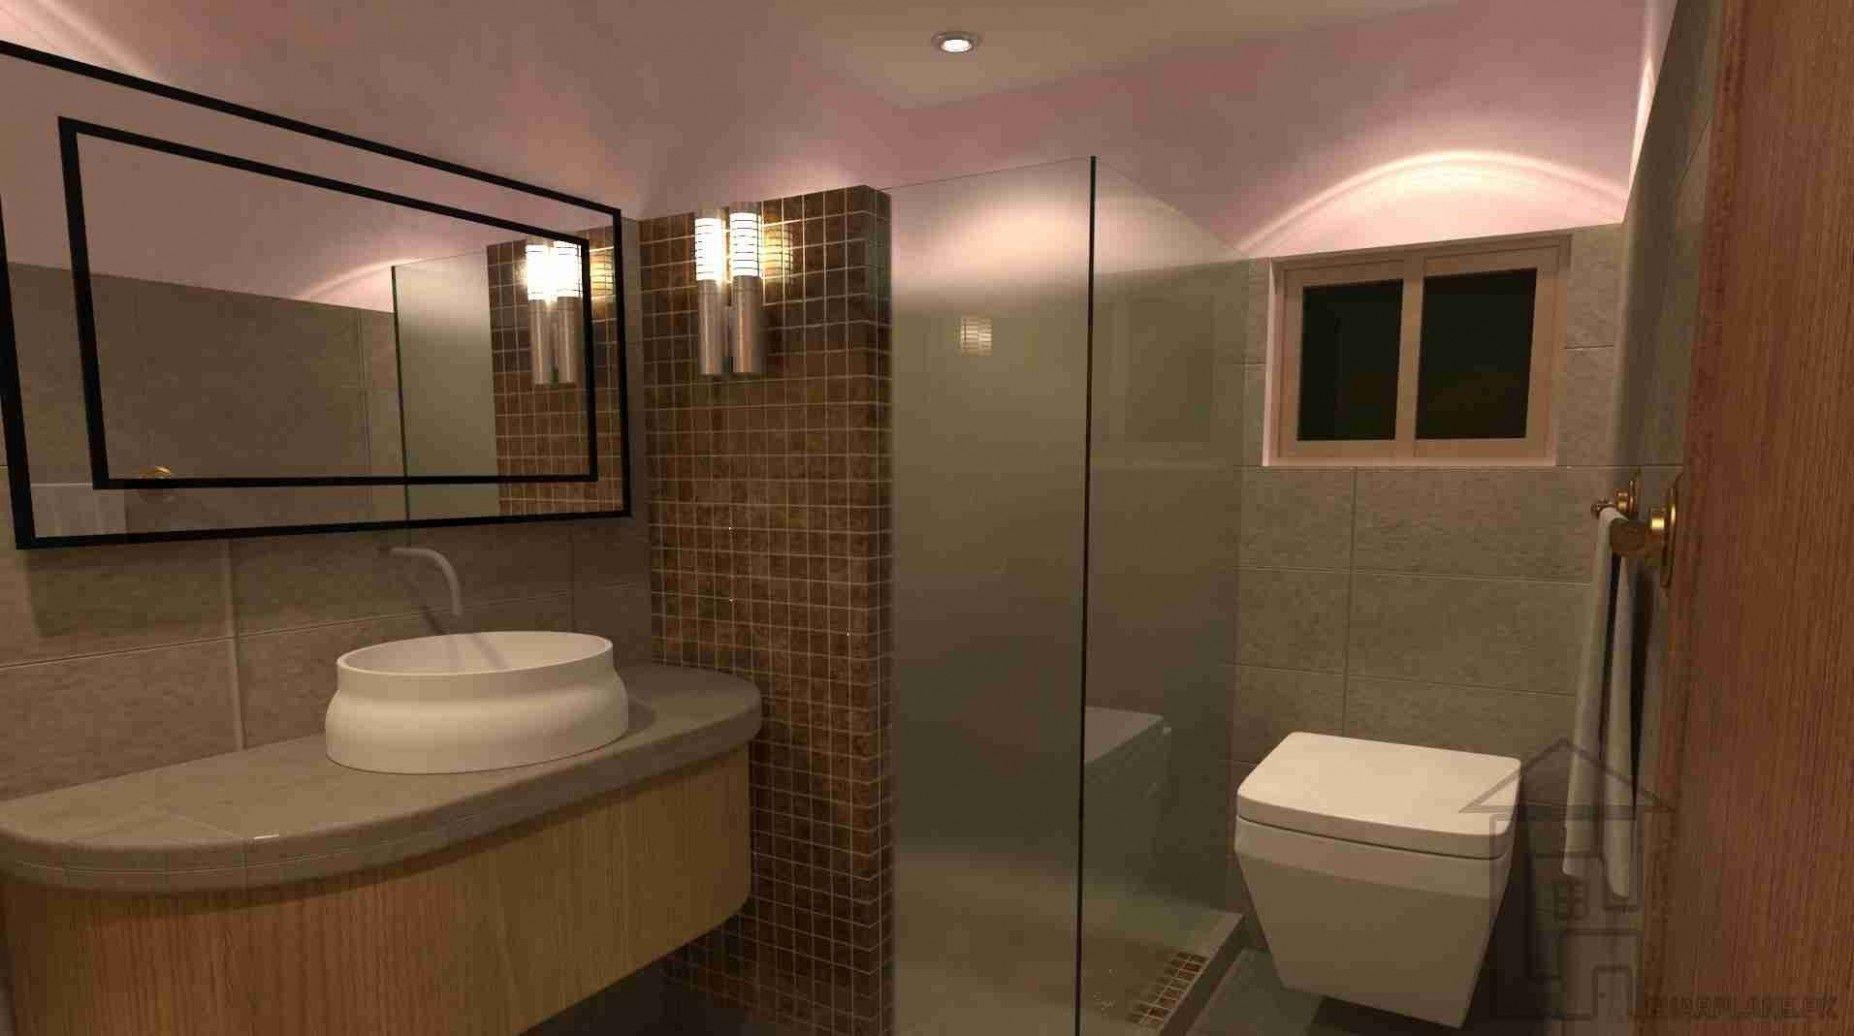 Small Bathroom Design Pakistan Pakistan New design for bathroom